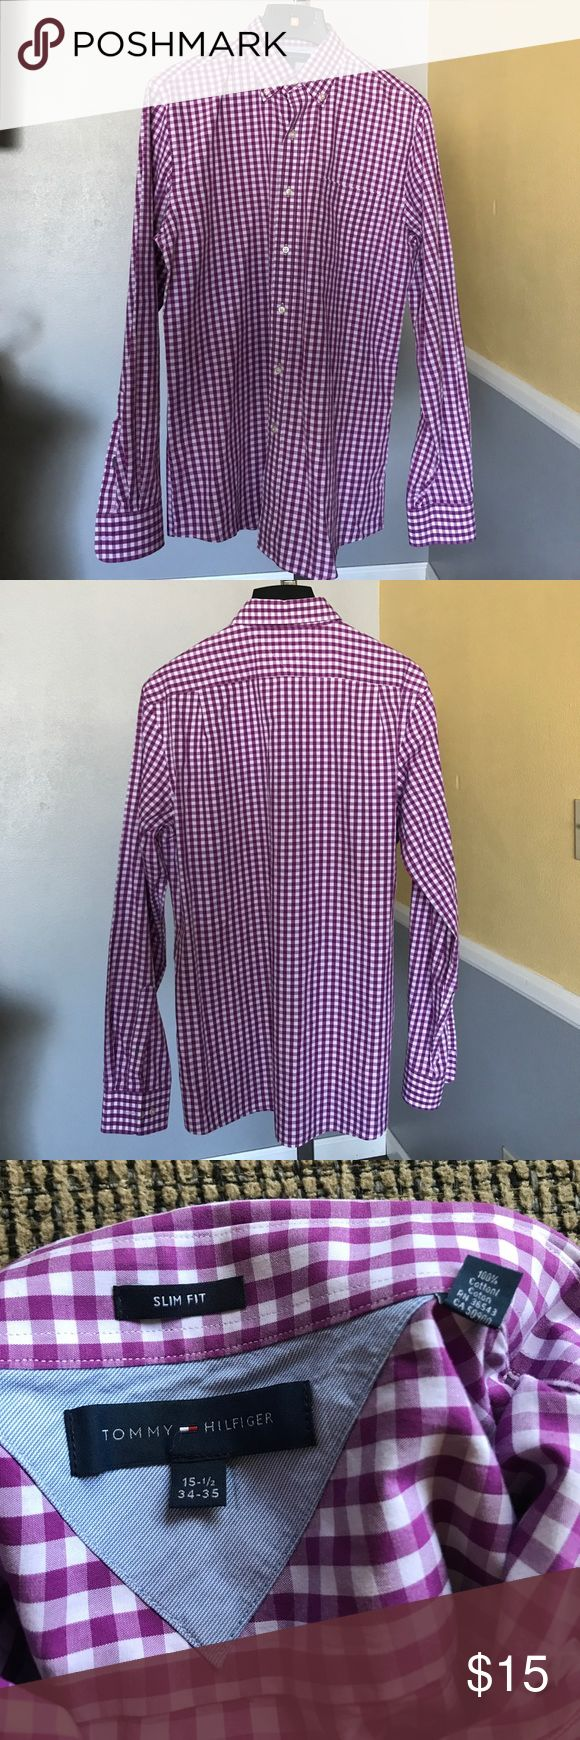 Tommy Hilfiger slim fit dress shirt 15.5 34-35 Worn once. Tommy Hilfiger Shirts Dress Shirts